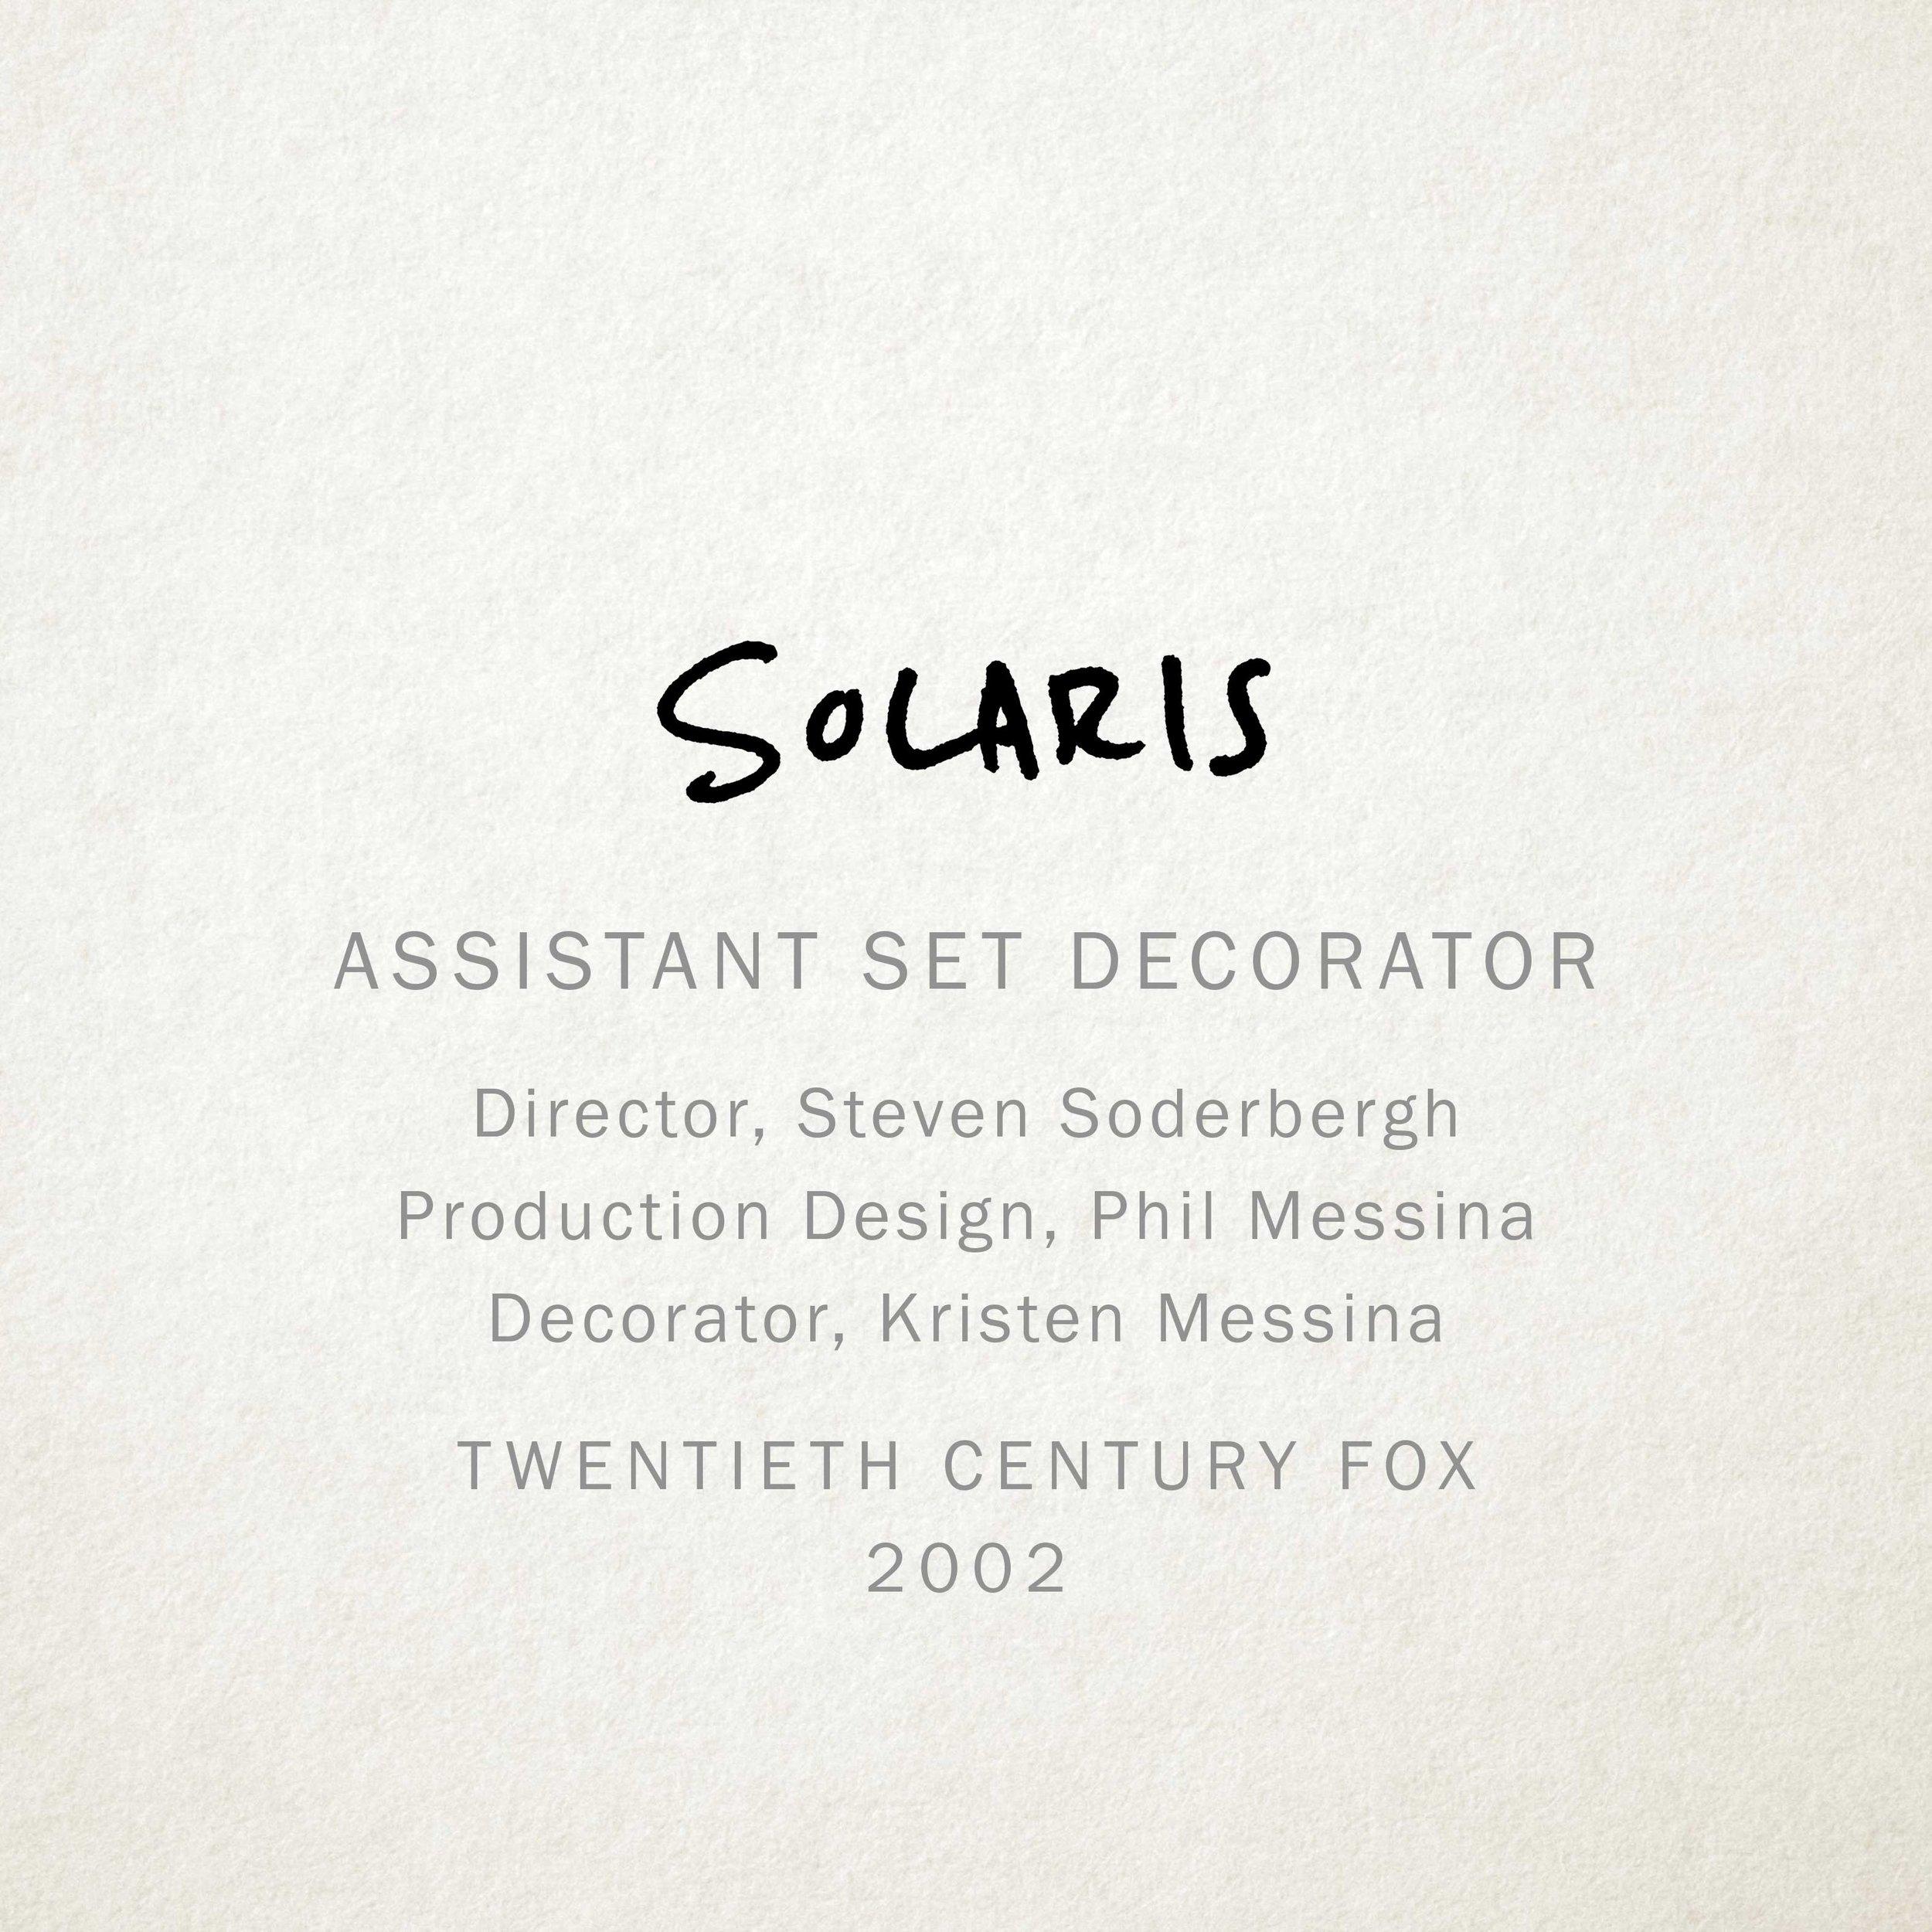 SSS-Film-Titles-1-Solaris.jpg